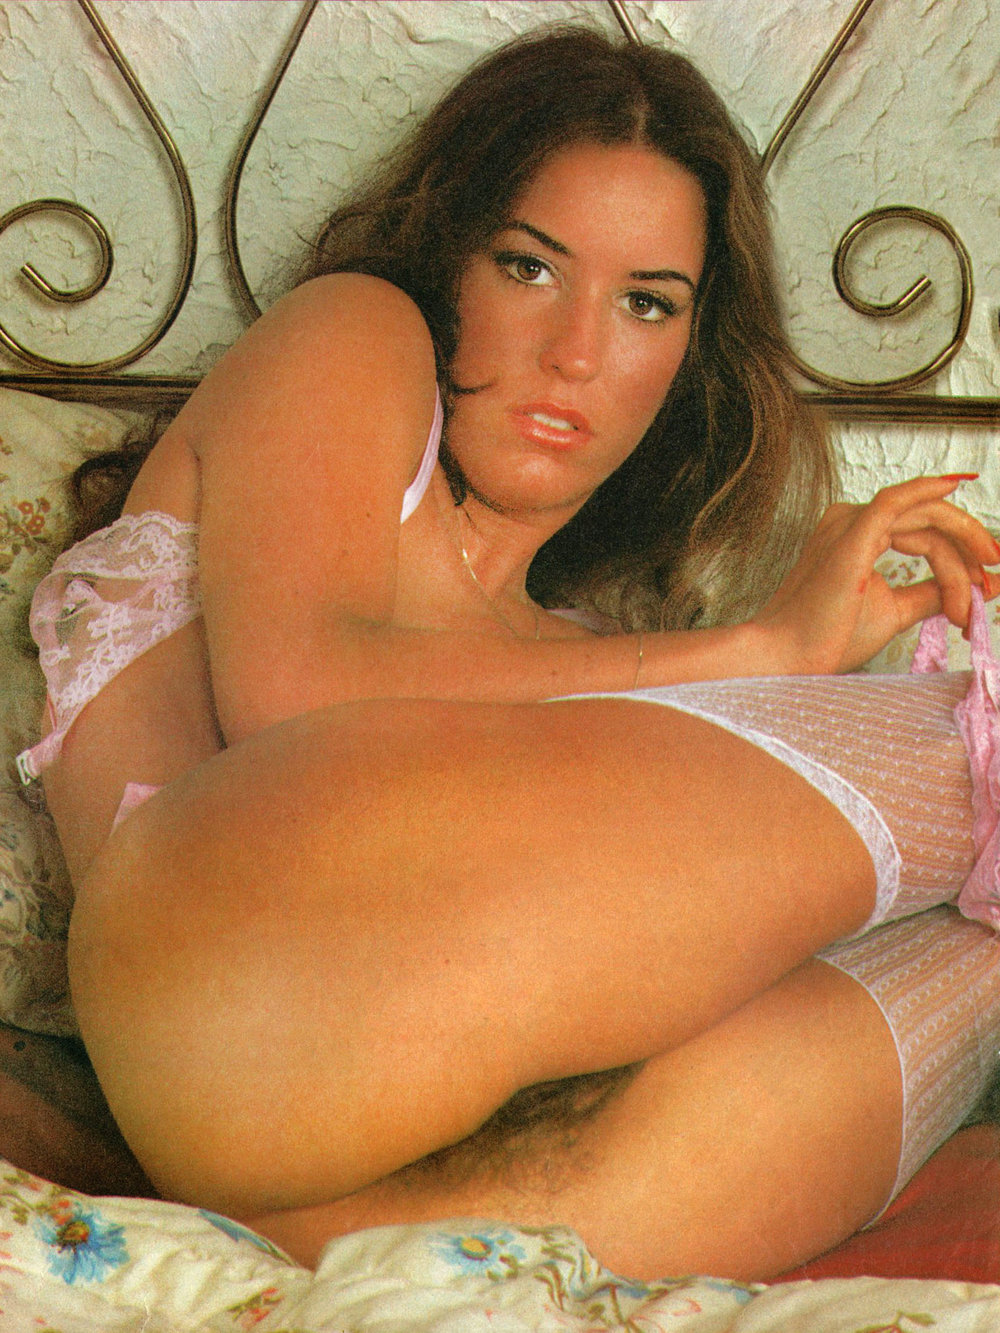 Pornstar Tina Ross aka Lauren Wilde 04.jpg